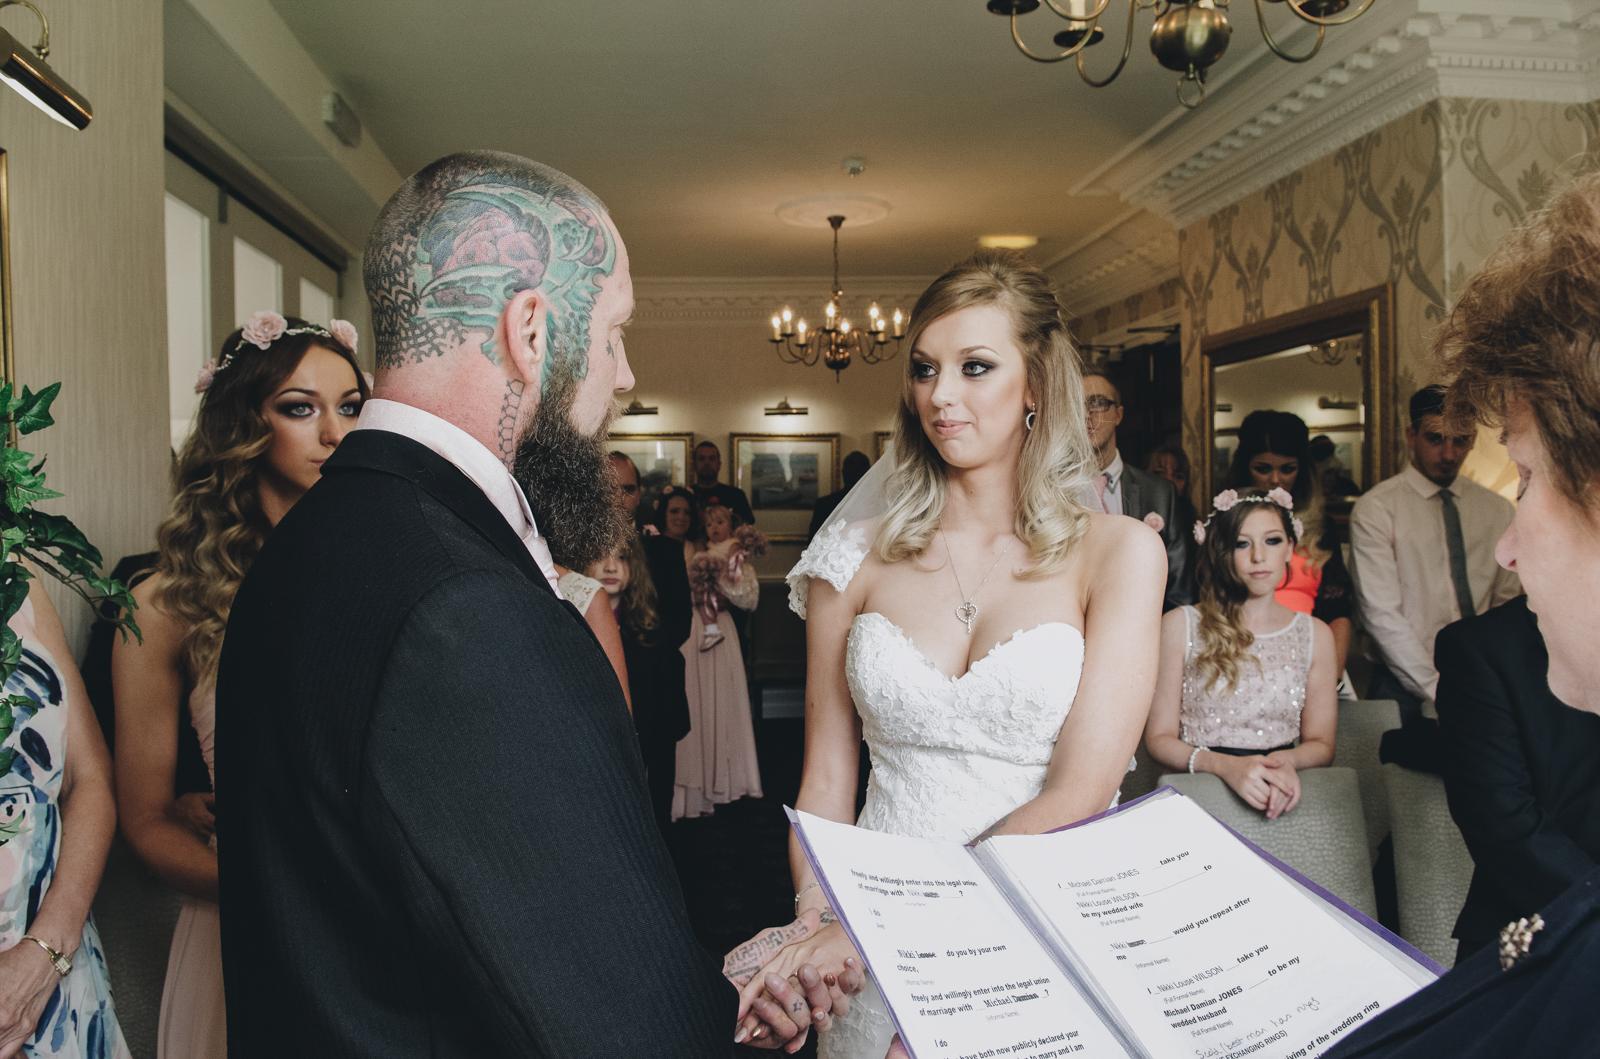 Alternative-North-West-Manchester-Wedding-Photography-Astley-bank-Wedding-skull-cake-tattooed-groom-16.jpg